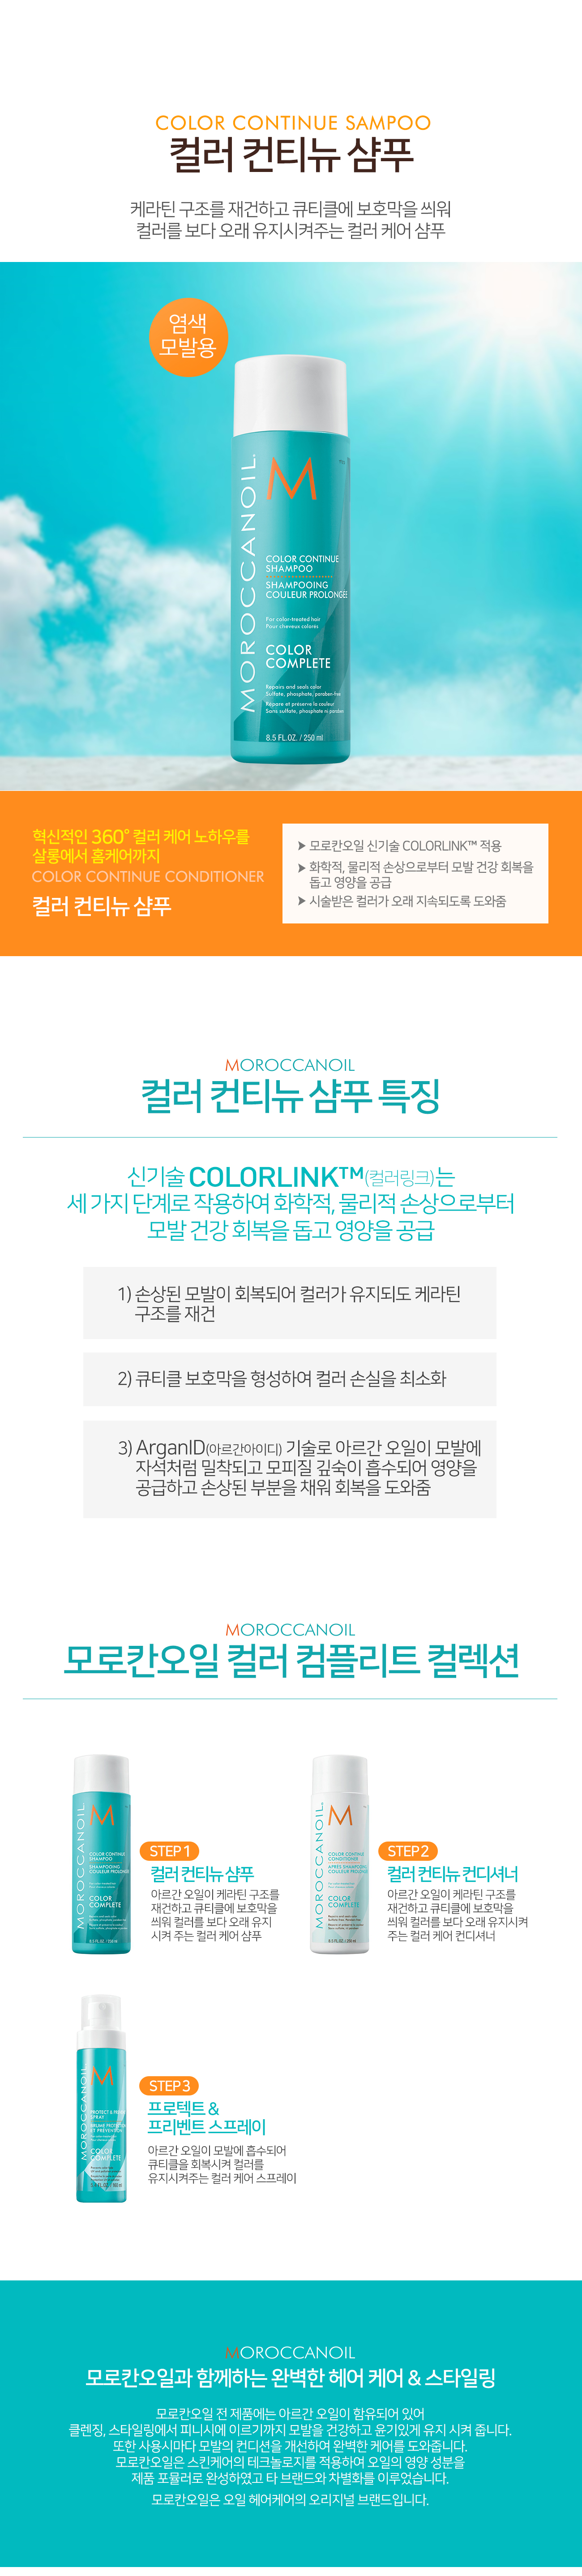 moroccanoil_colorcontinue_sampoo.jpg